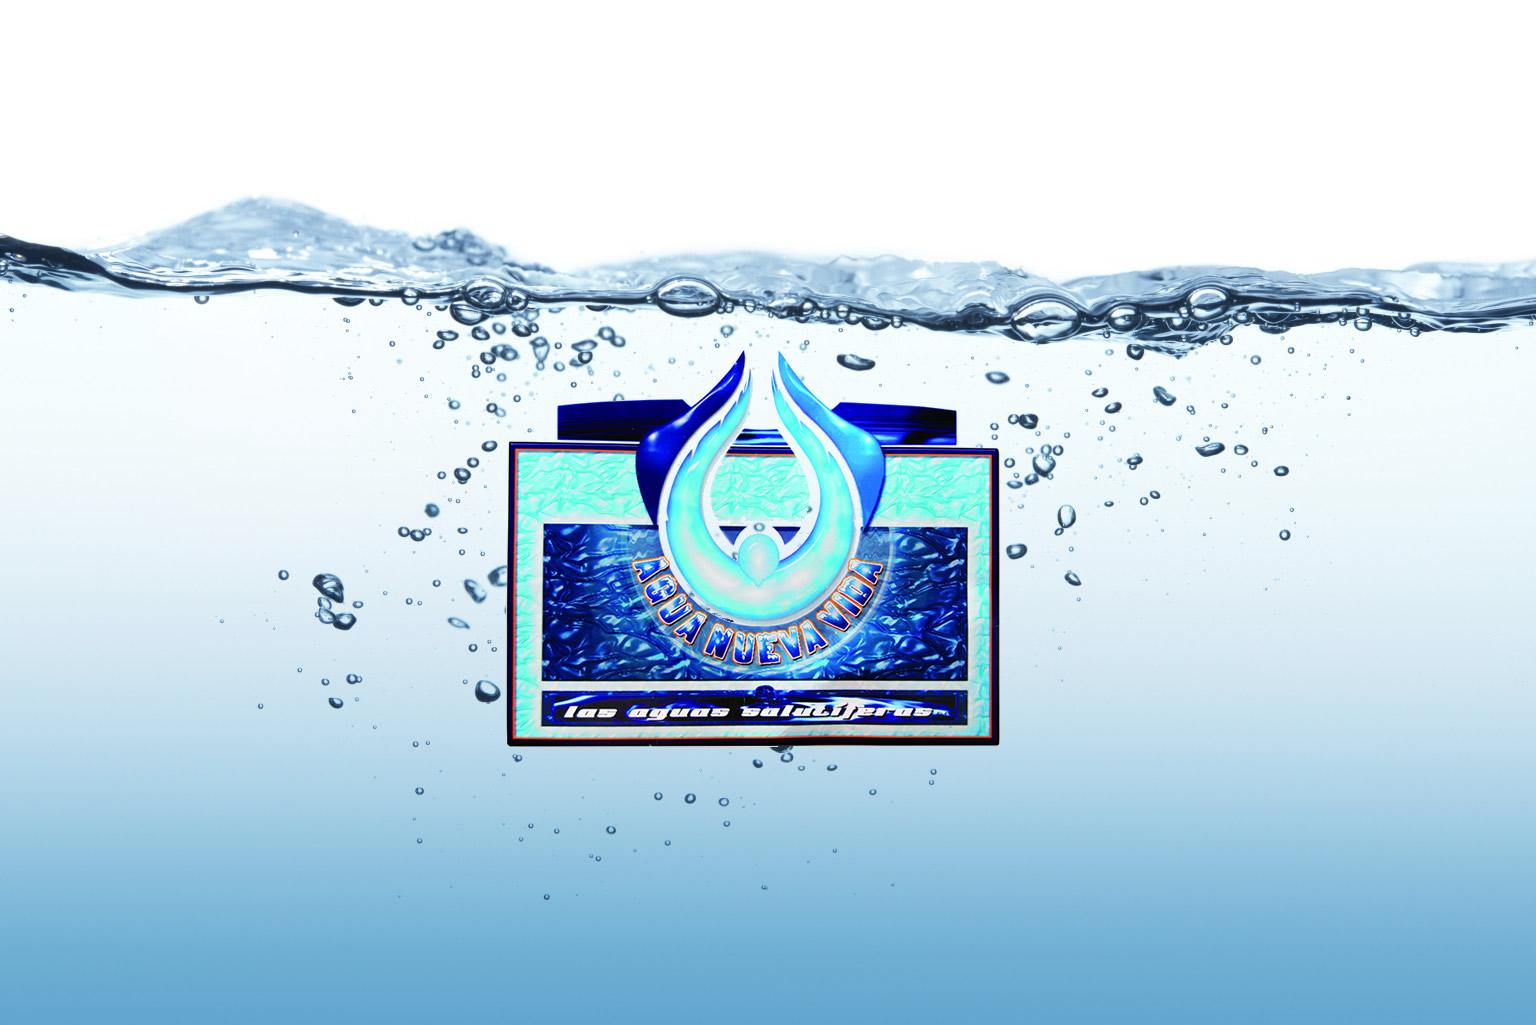 Waterbluegua-nueva-vida